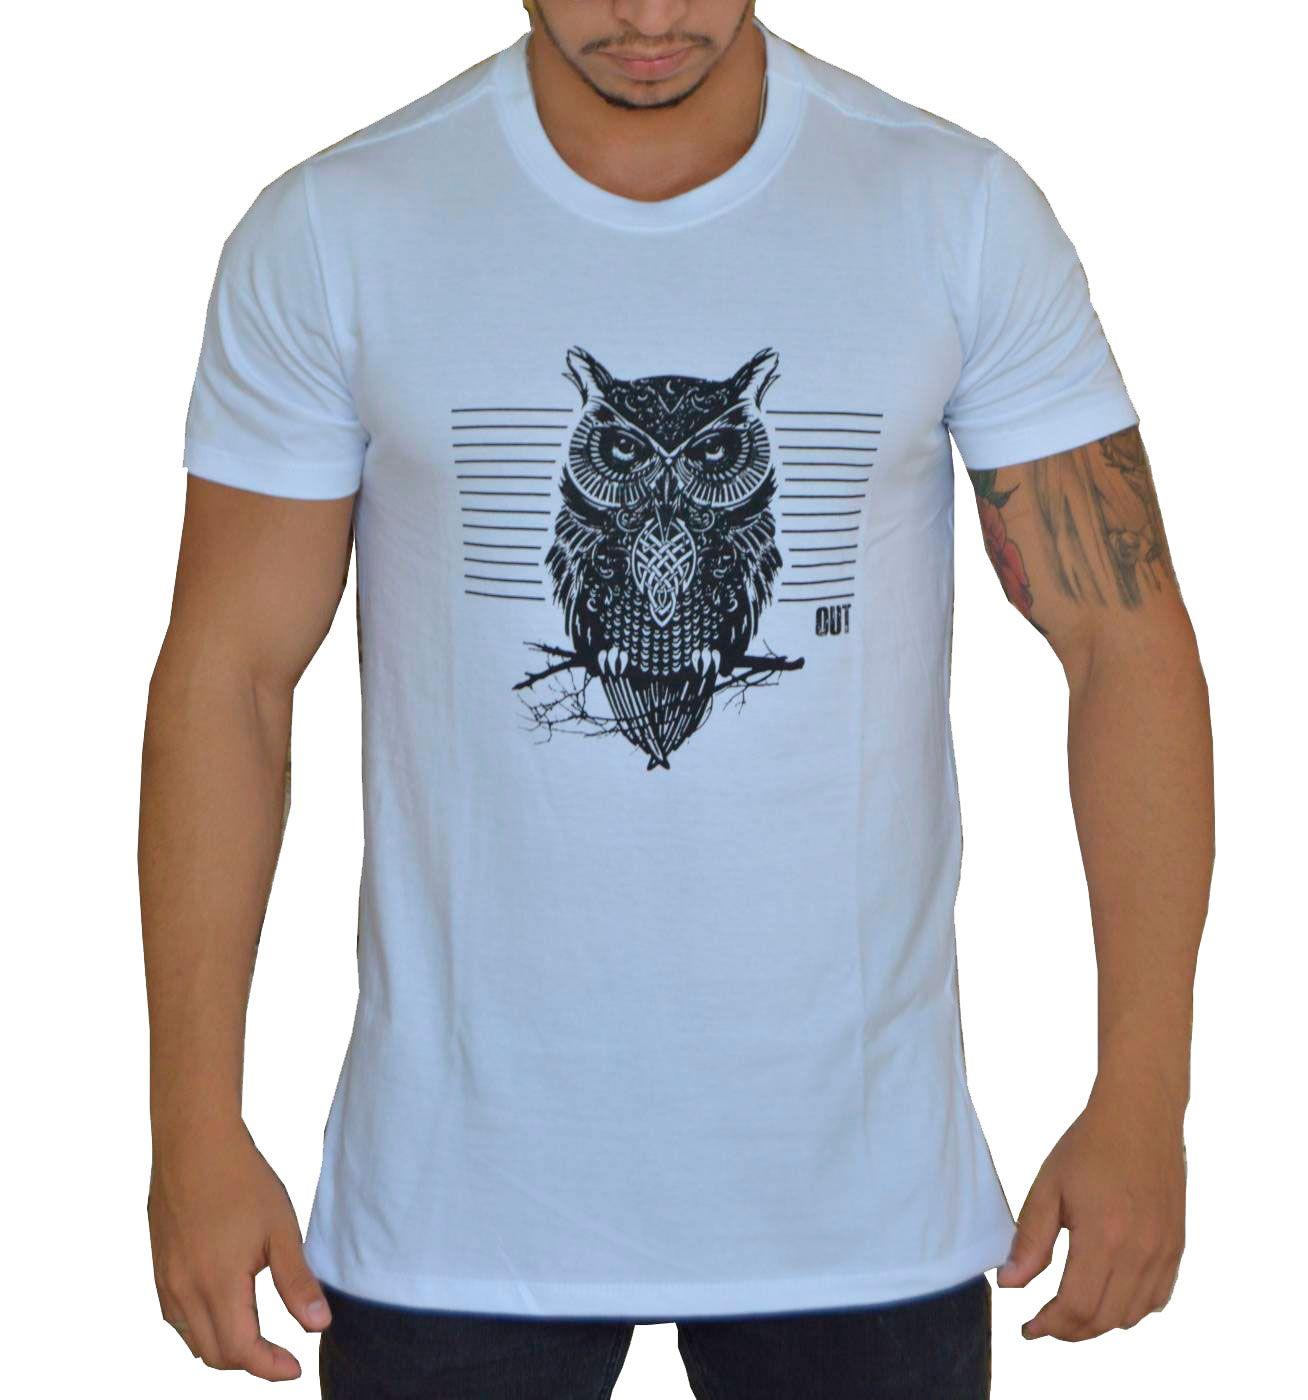 Camiseta Coruja com Fecho nas Laterais - Branca